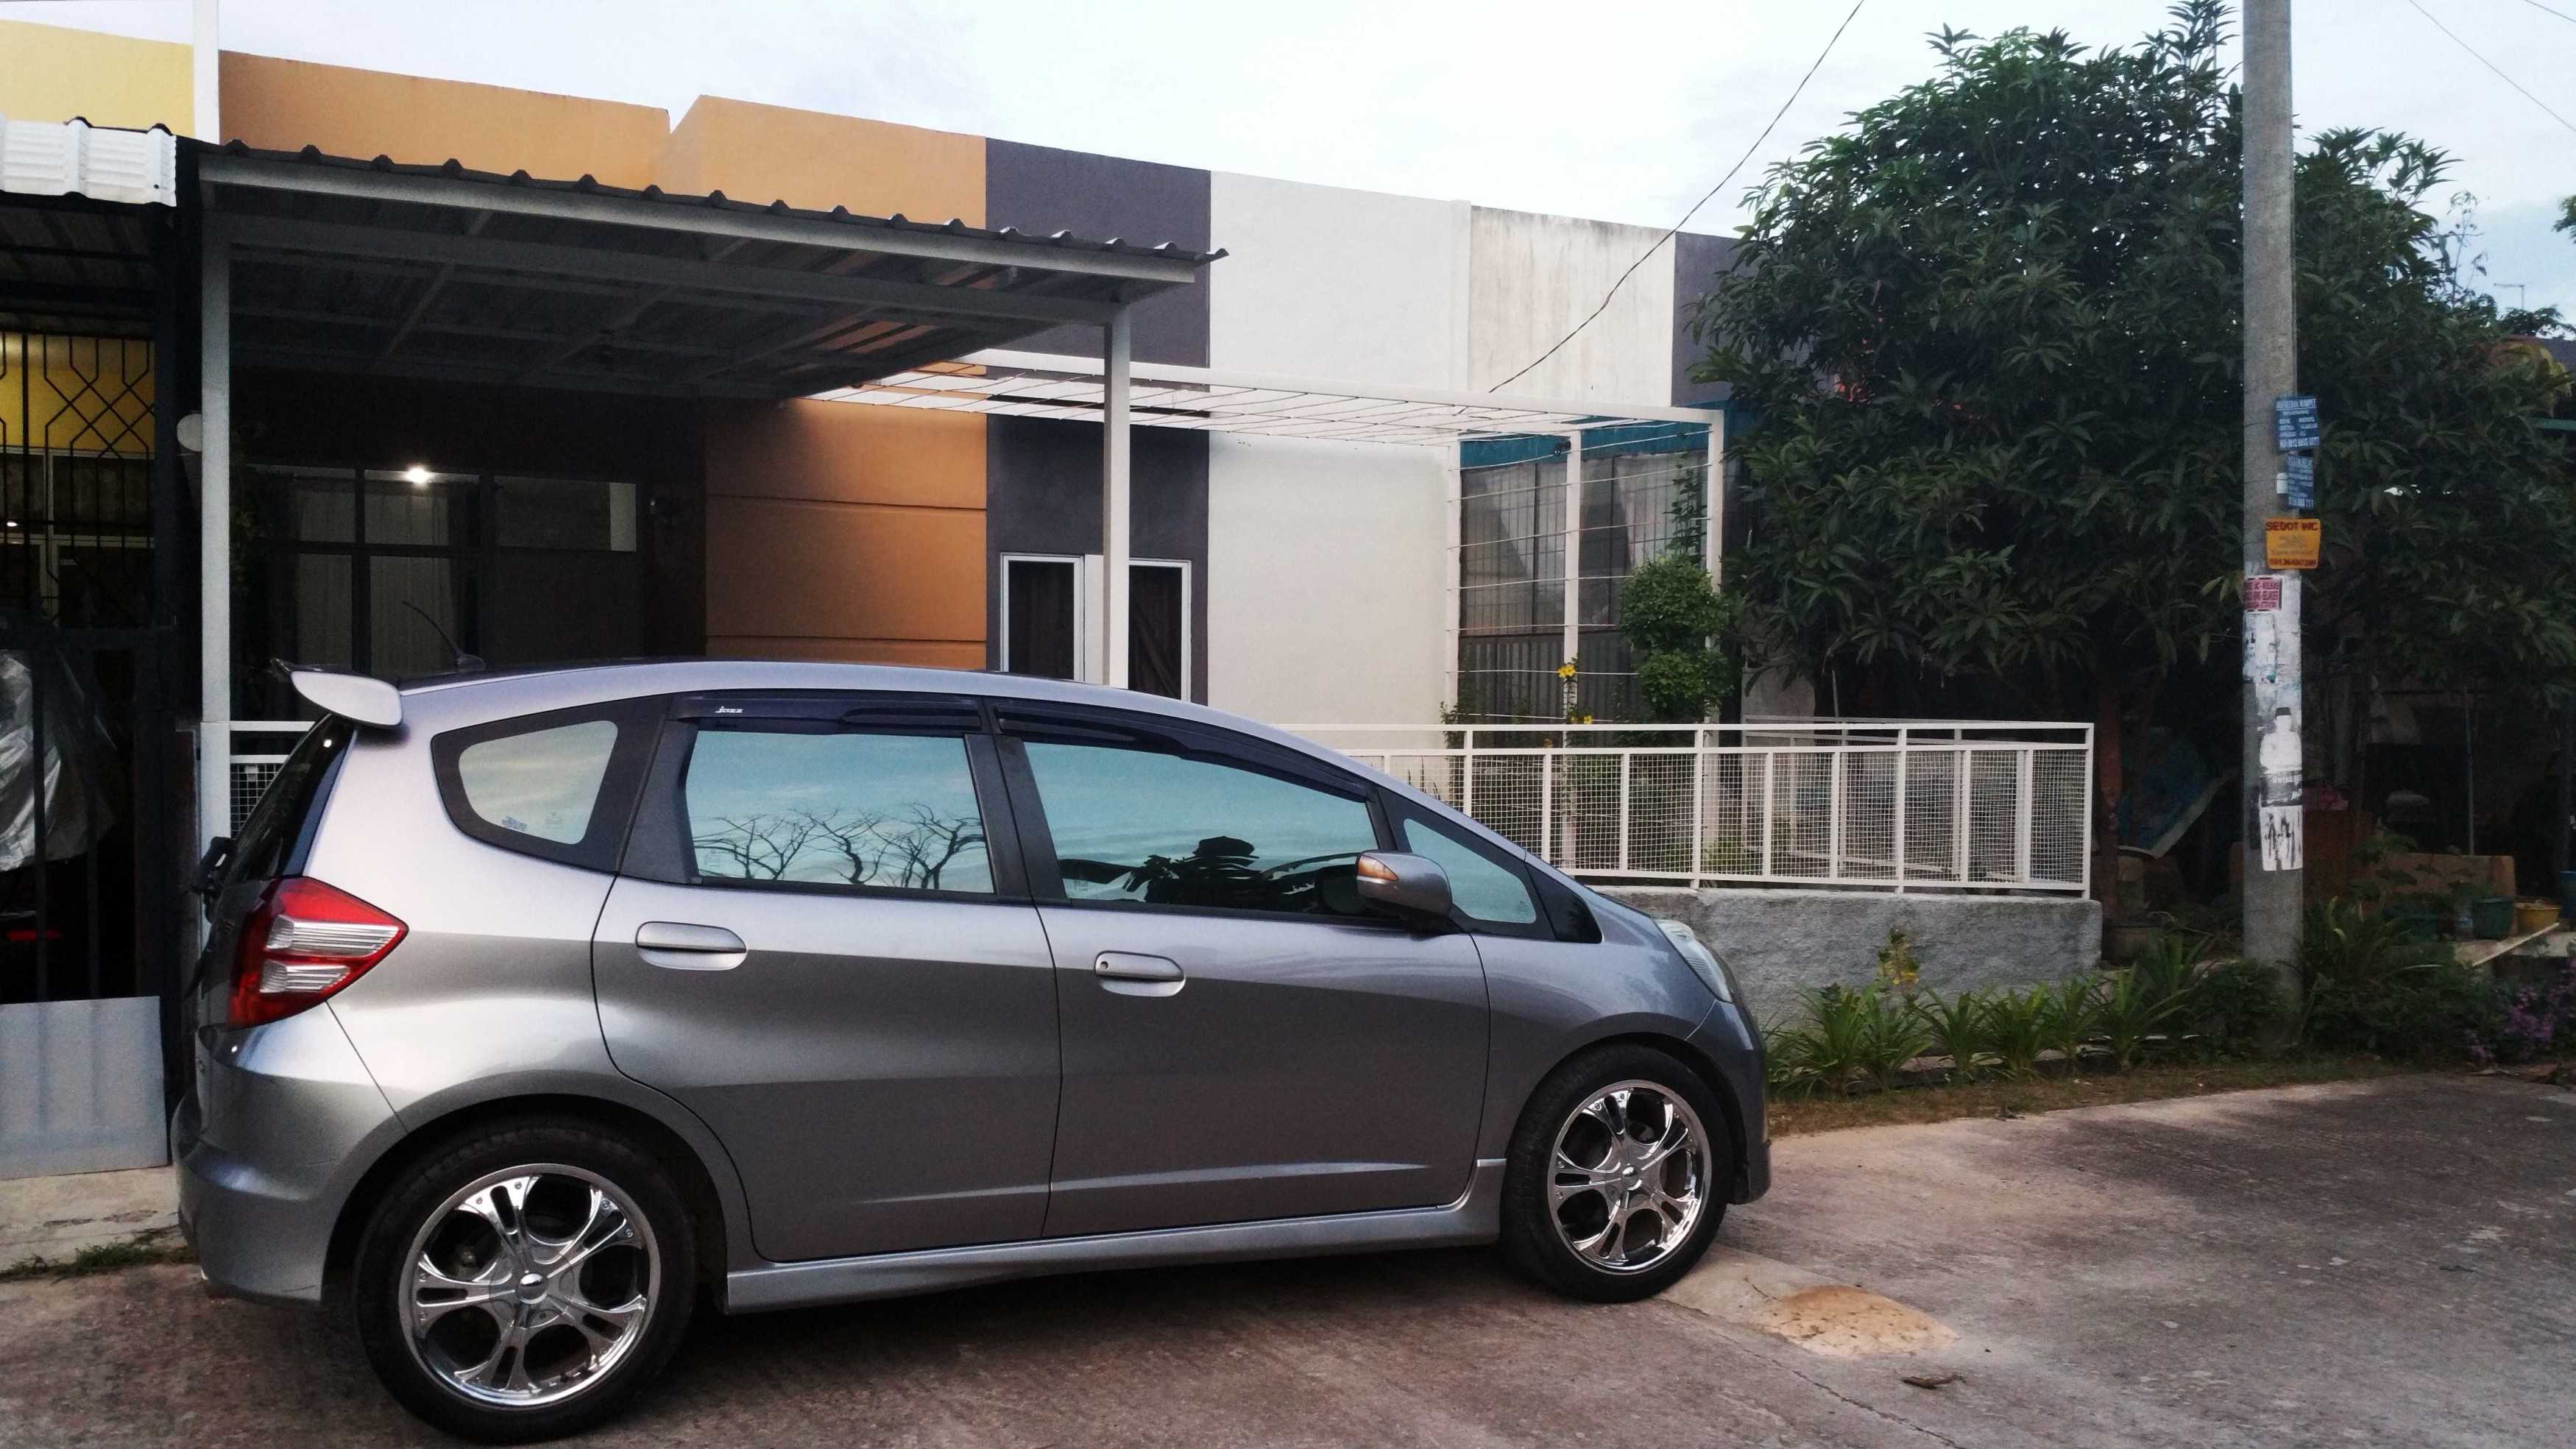 Gilbert Yohannes Voerman Ch House Batam Batam Photo-27173   27173